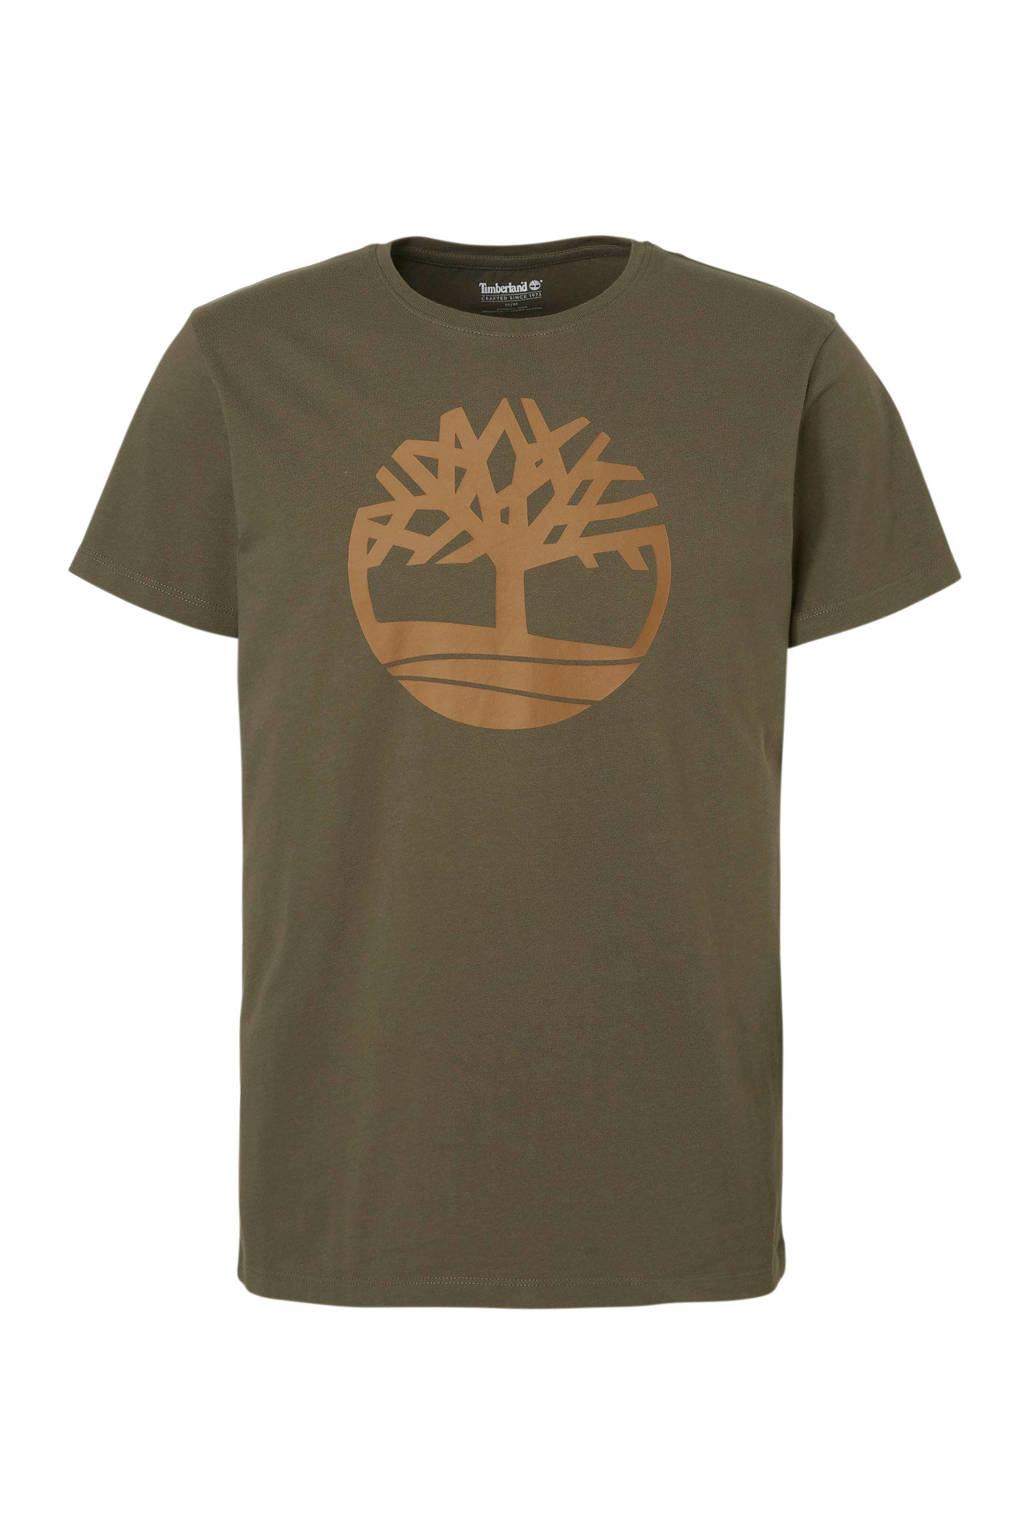 Timberland T-shirt met print groen, Kaki/groen